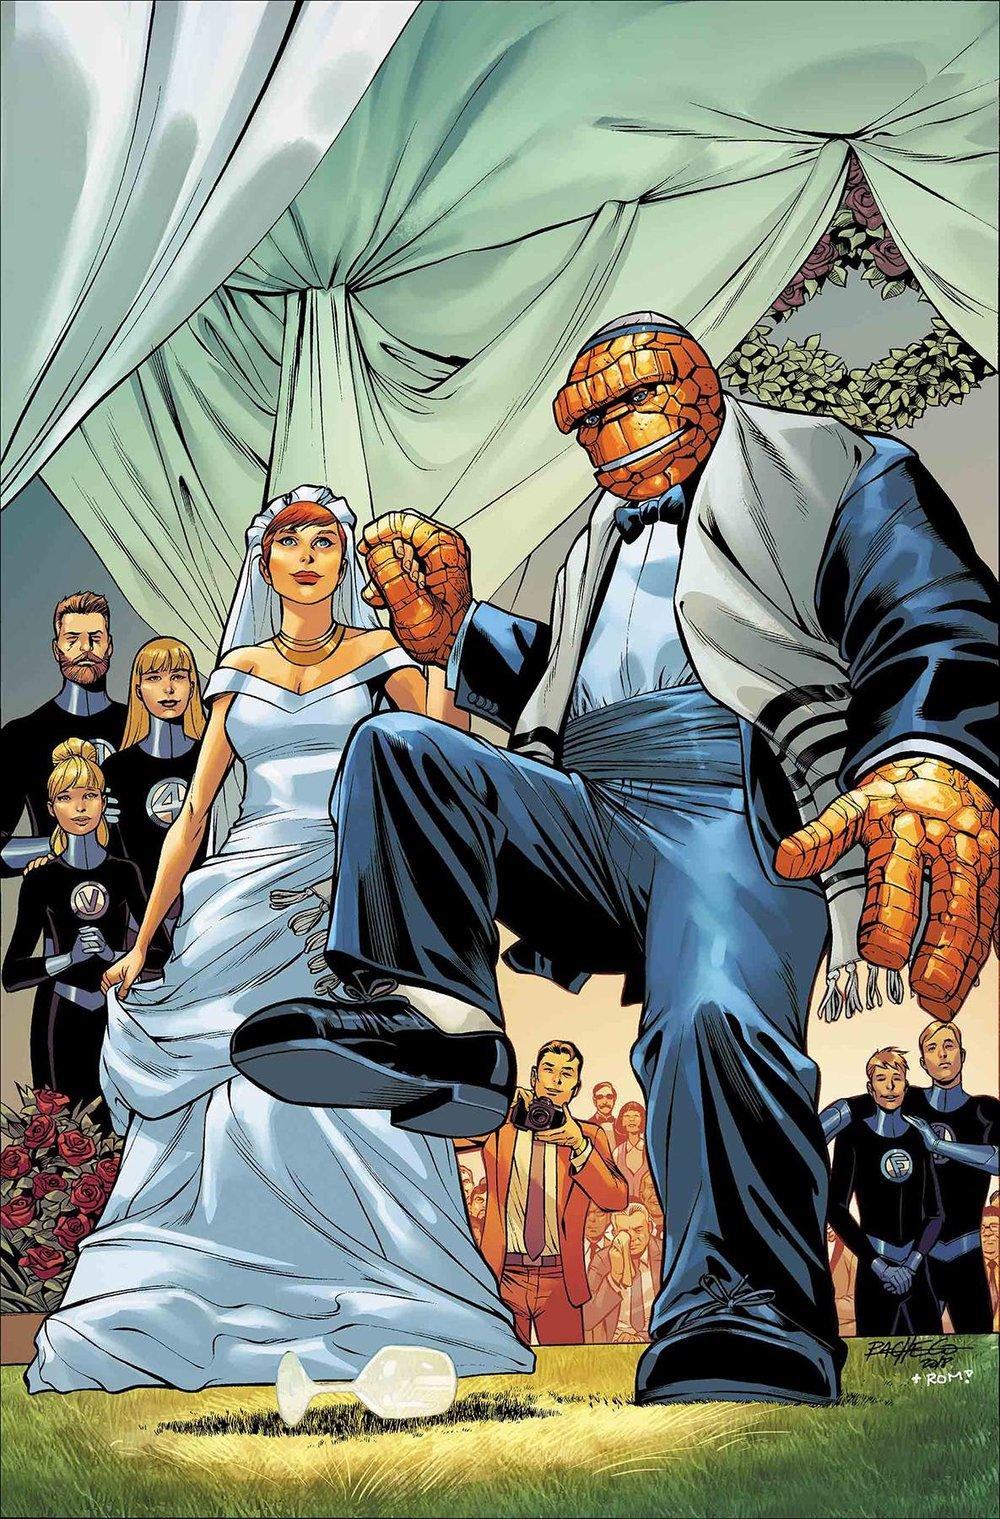 FANTASTIC FOUR WEDDING SPECIAL #1